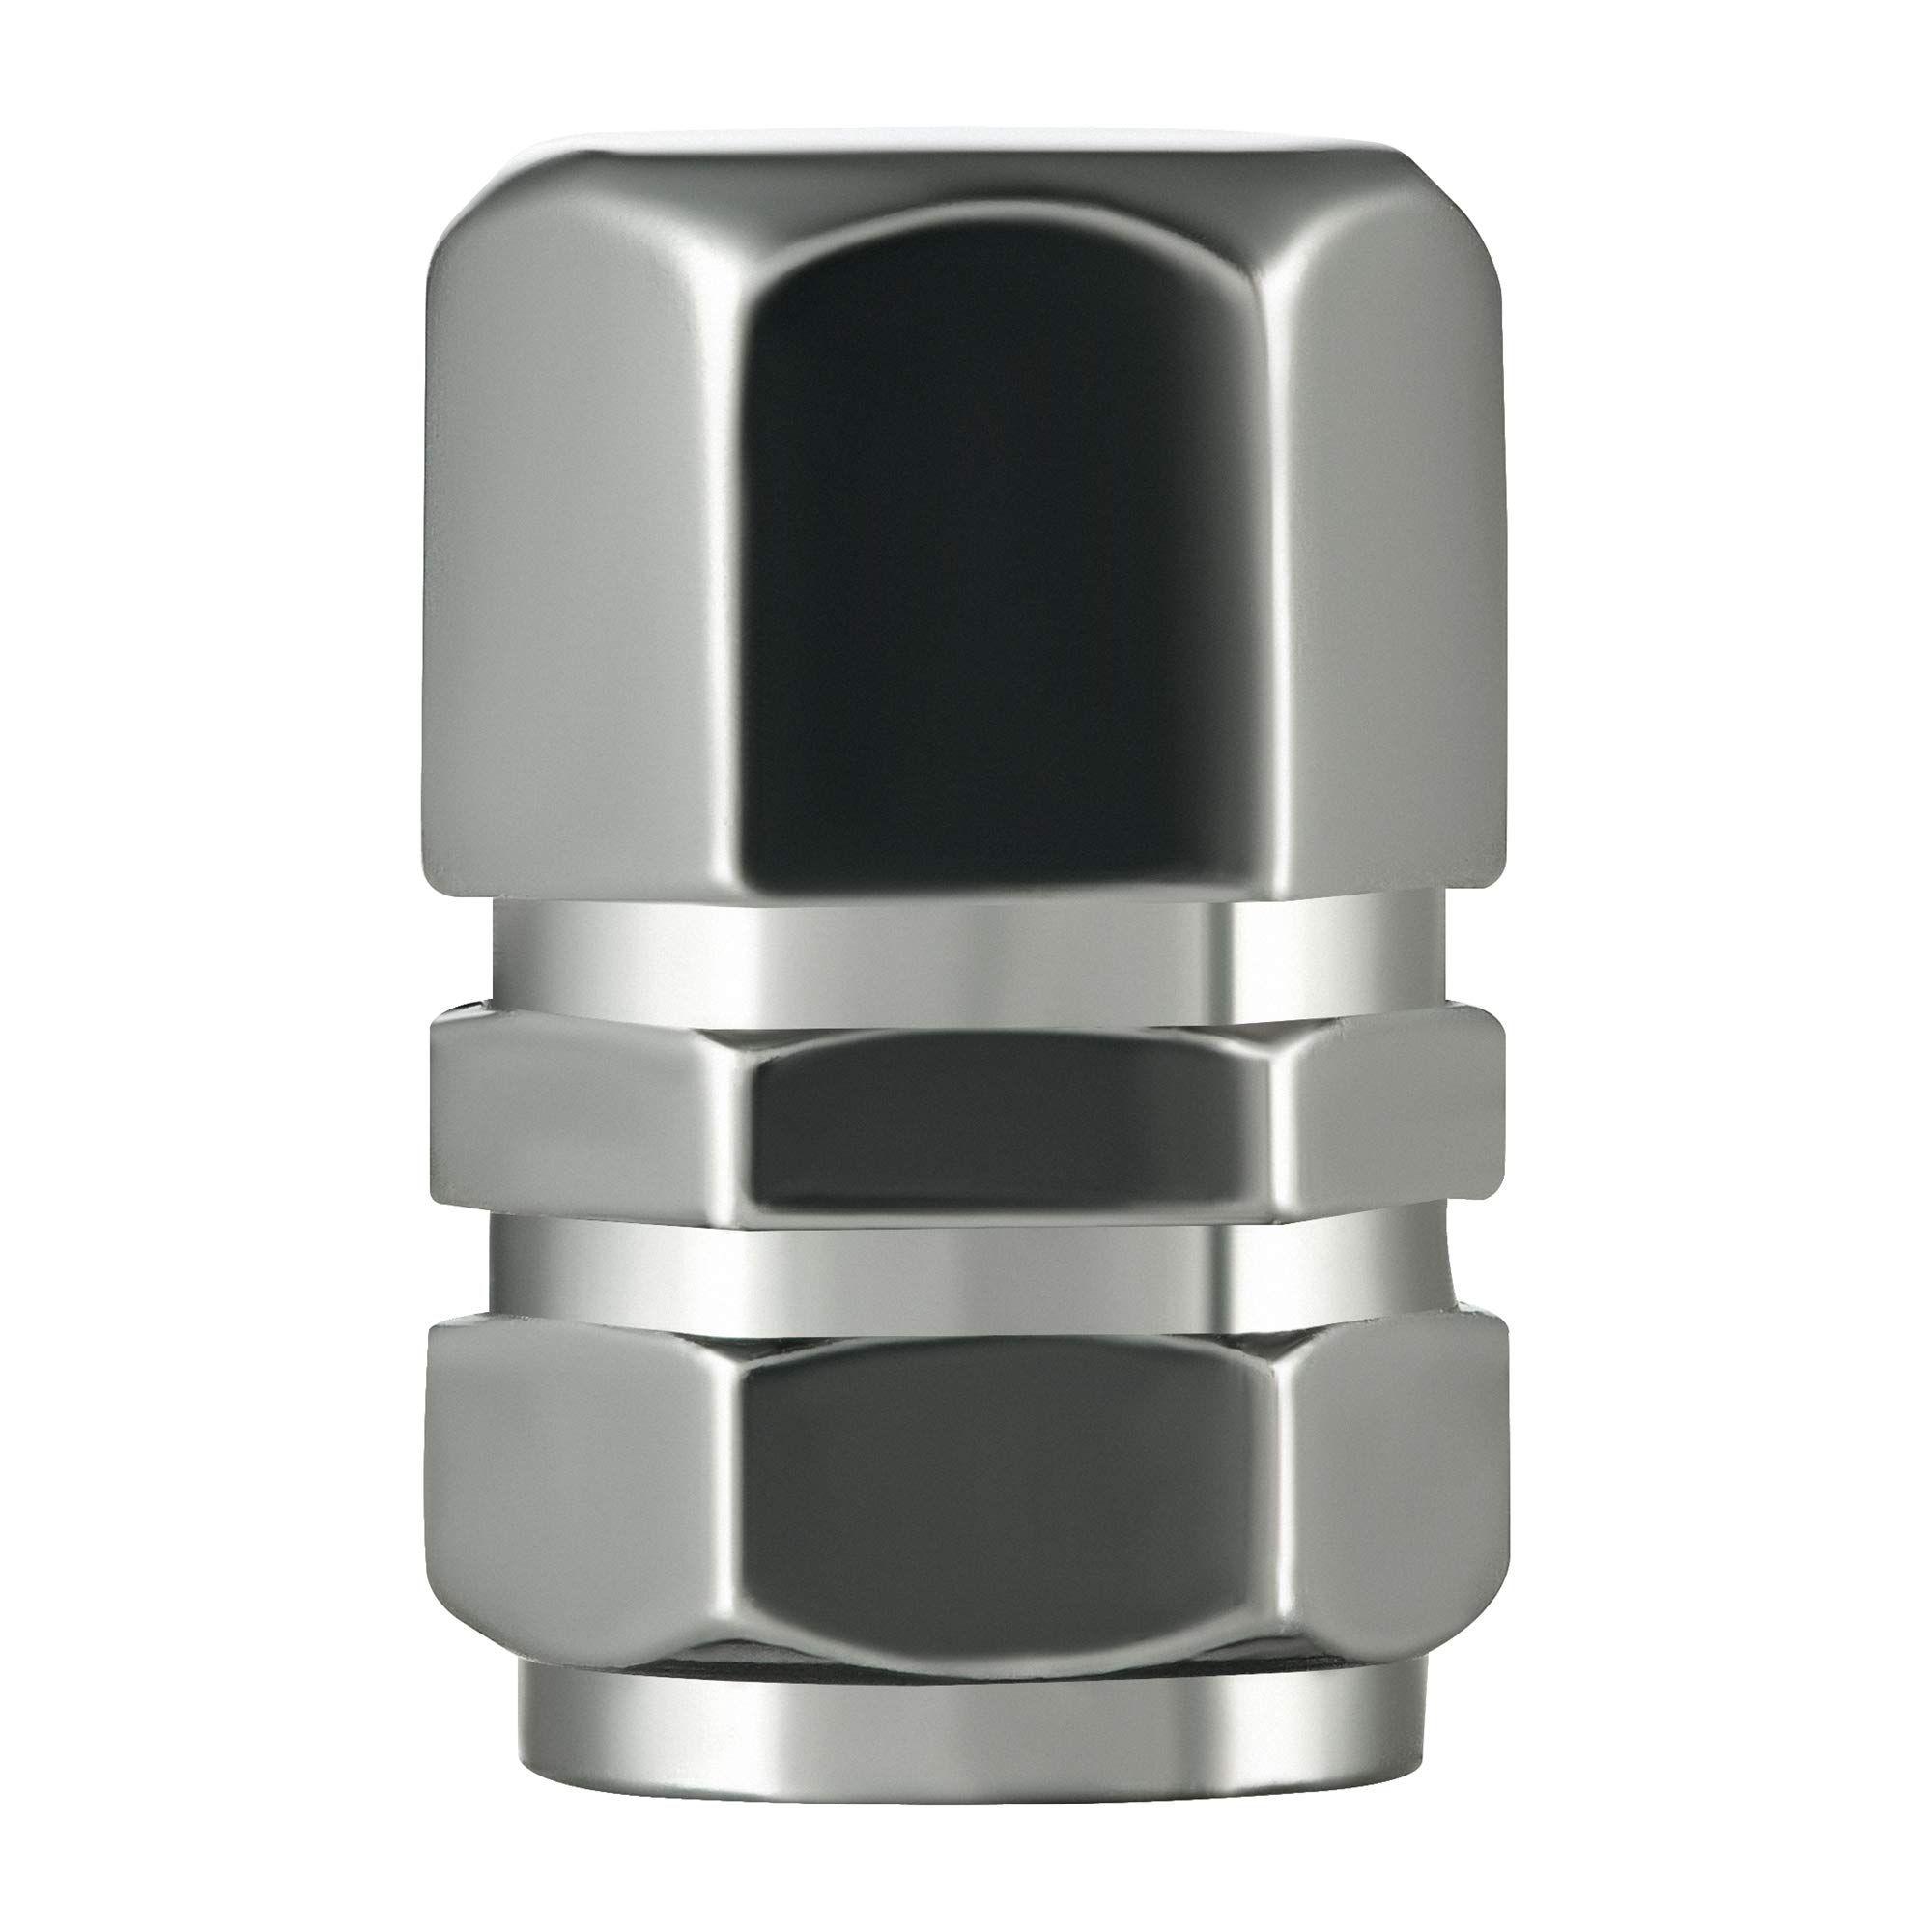 ValveLoc Tire Valve Caps (10Pack) HeavyDuty Stem Covers